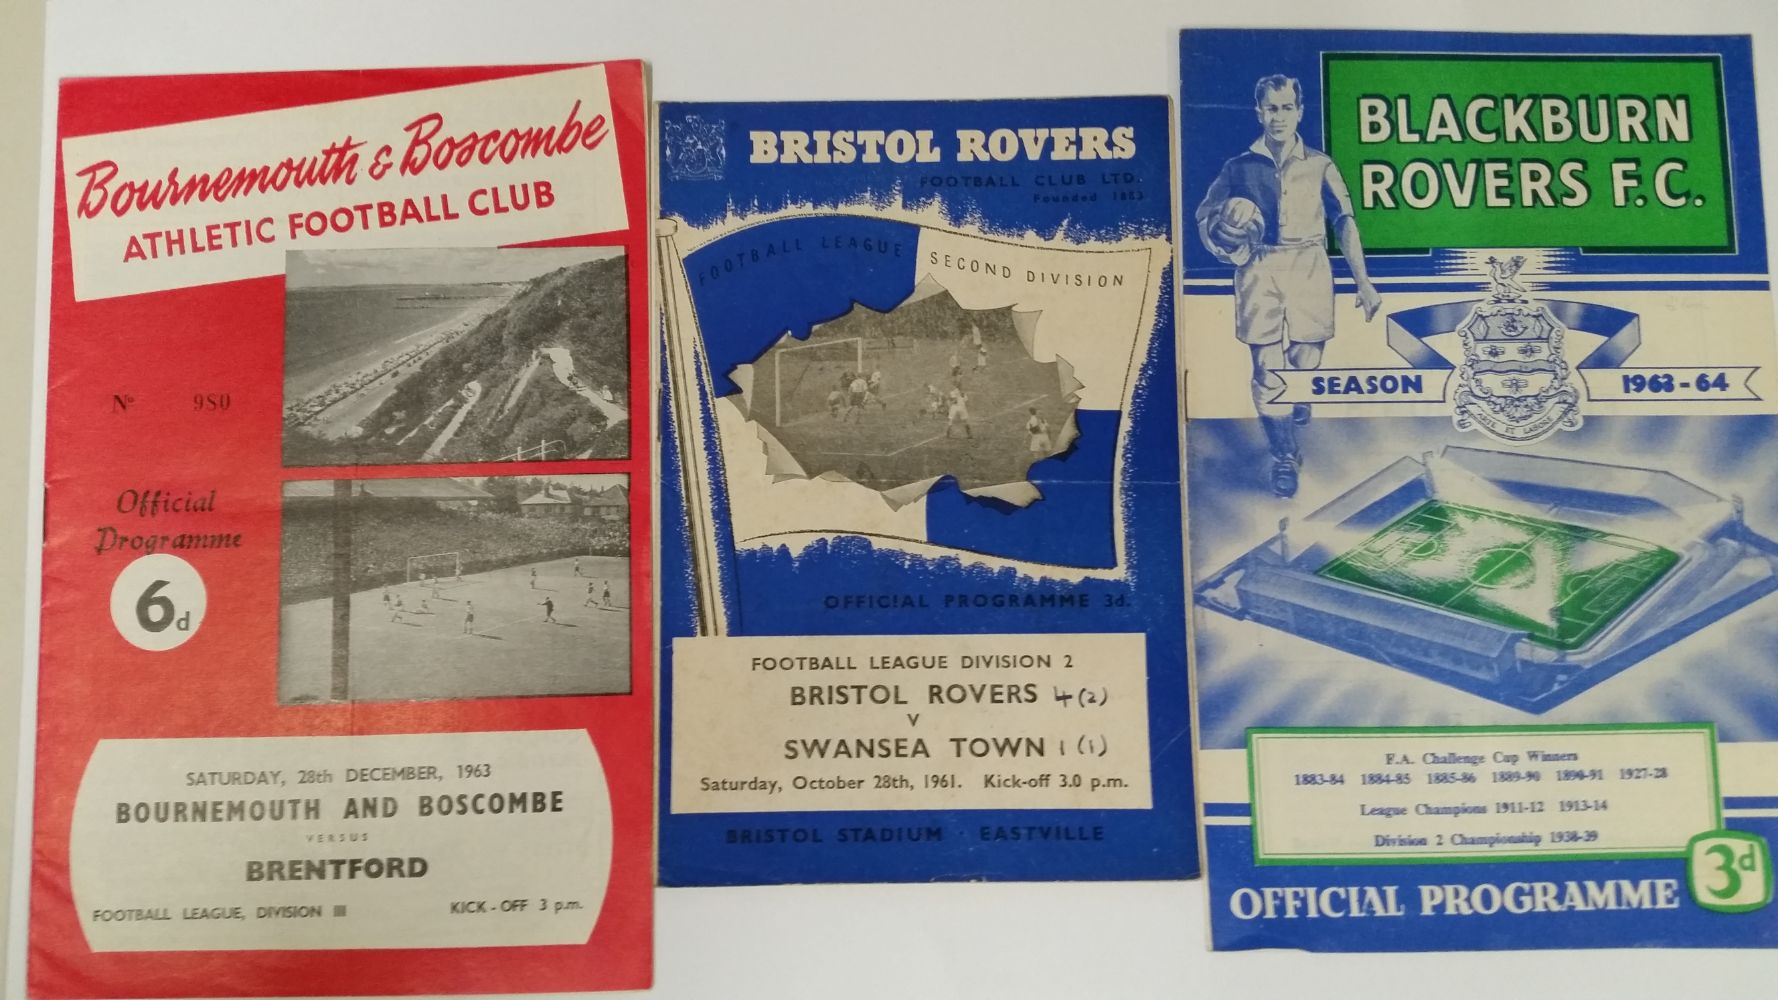 Sporting Memorabilia; Ephemera and Cigarette Cards & Trade Cards - Tim Davidson Auctions Ltd.